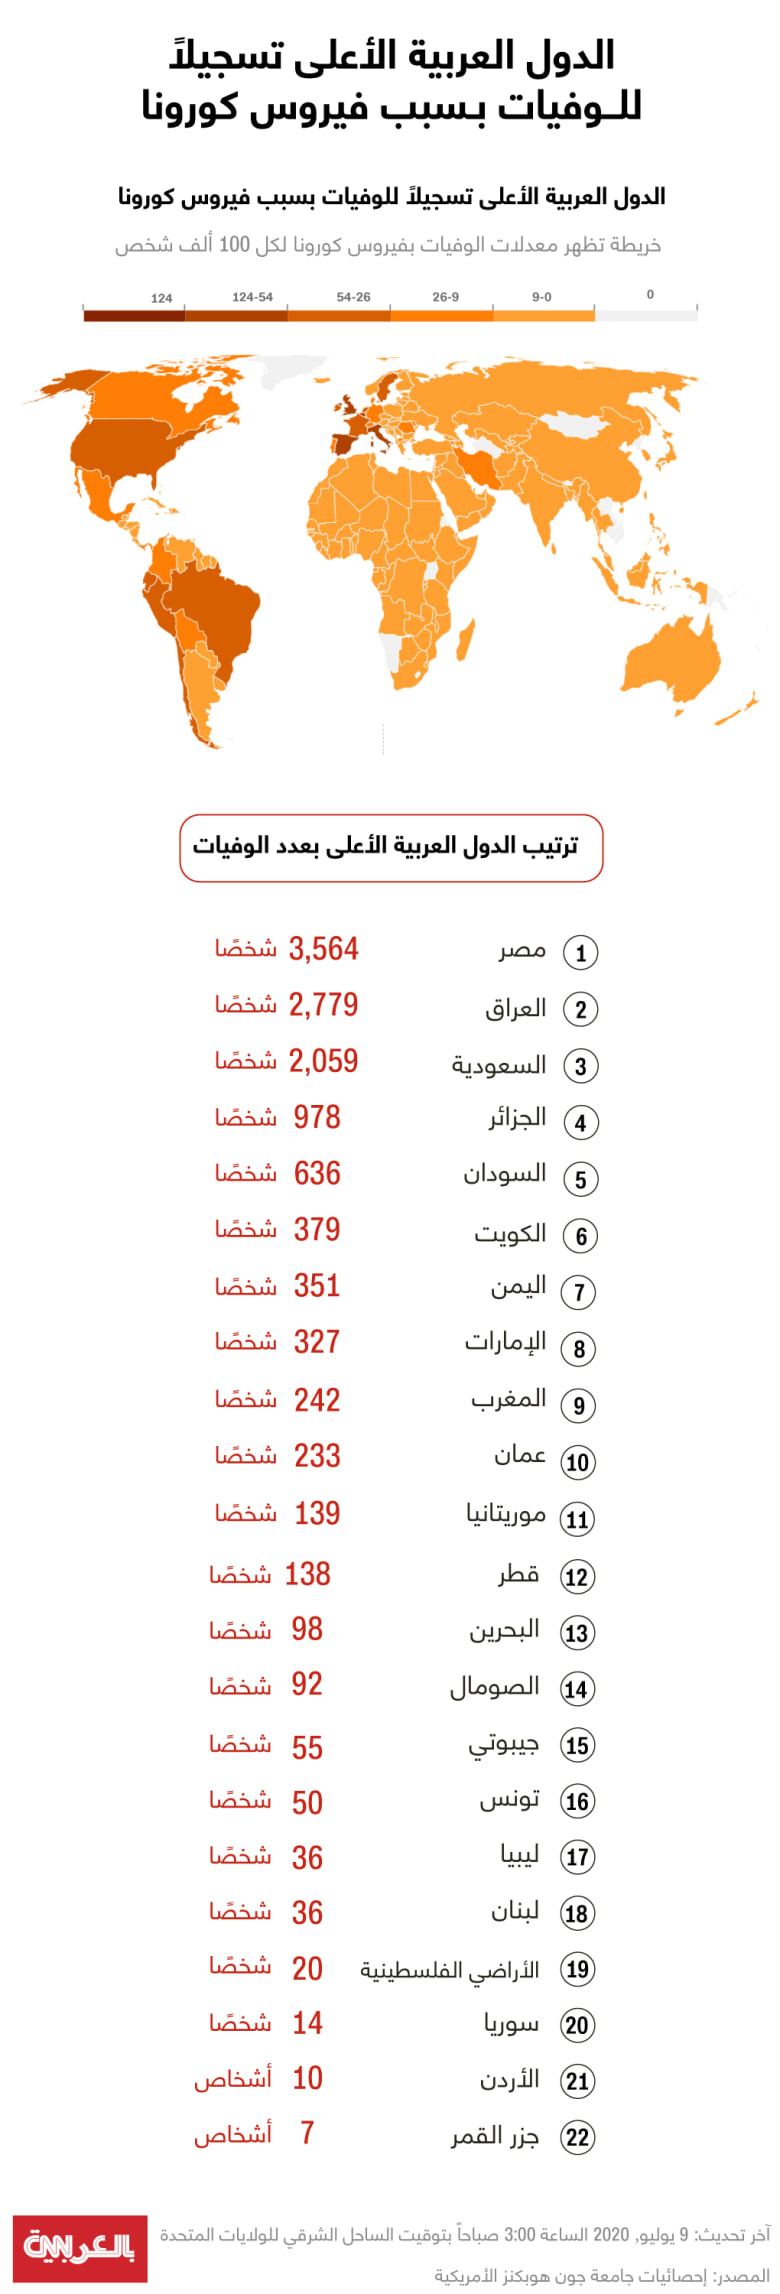 arabic countries-deaths-july 9